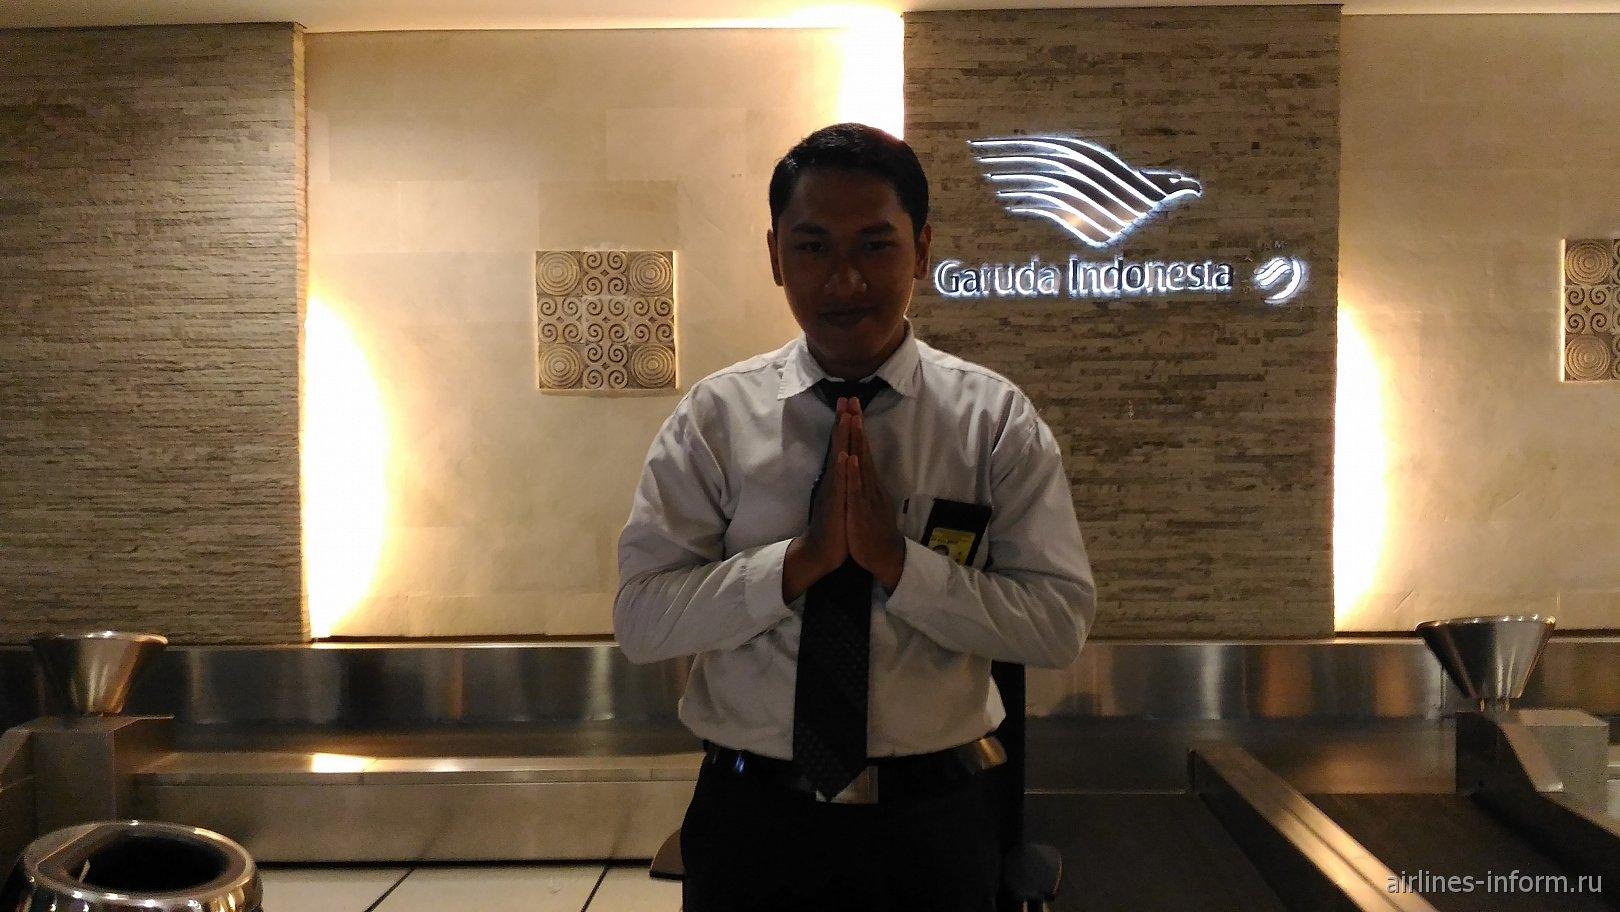 Сотрудник авиакомпании Garuda Indonesia